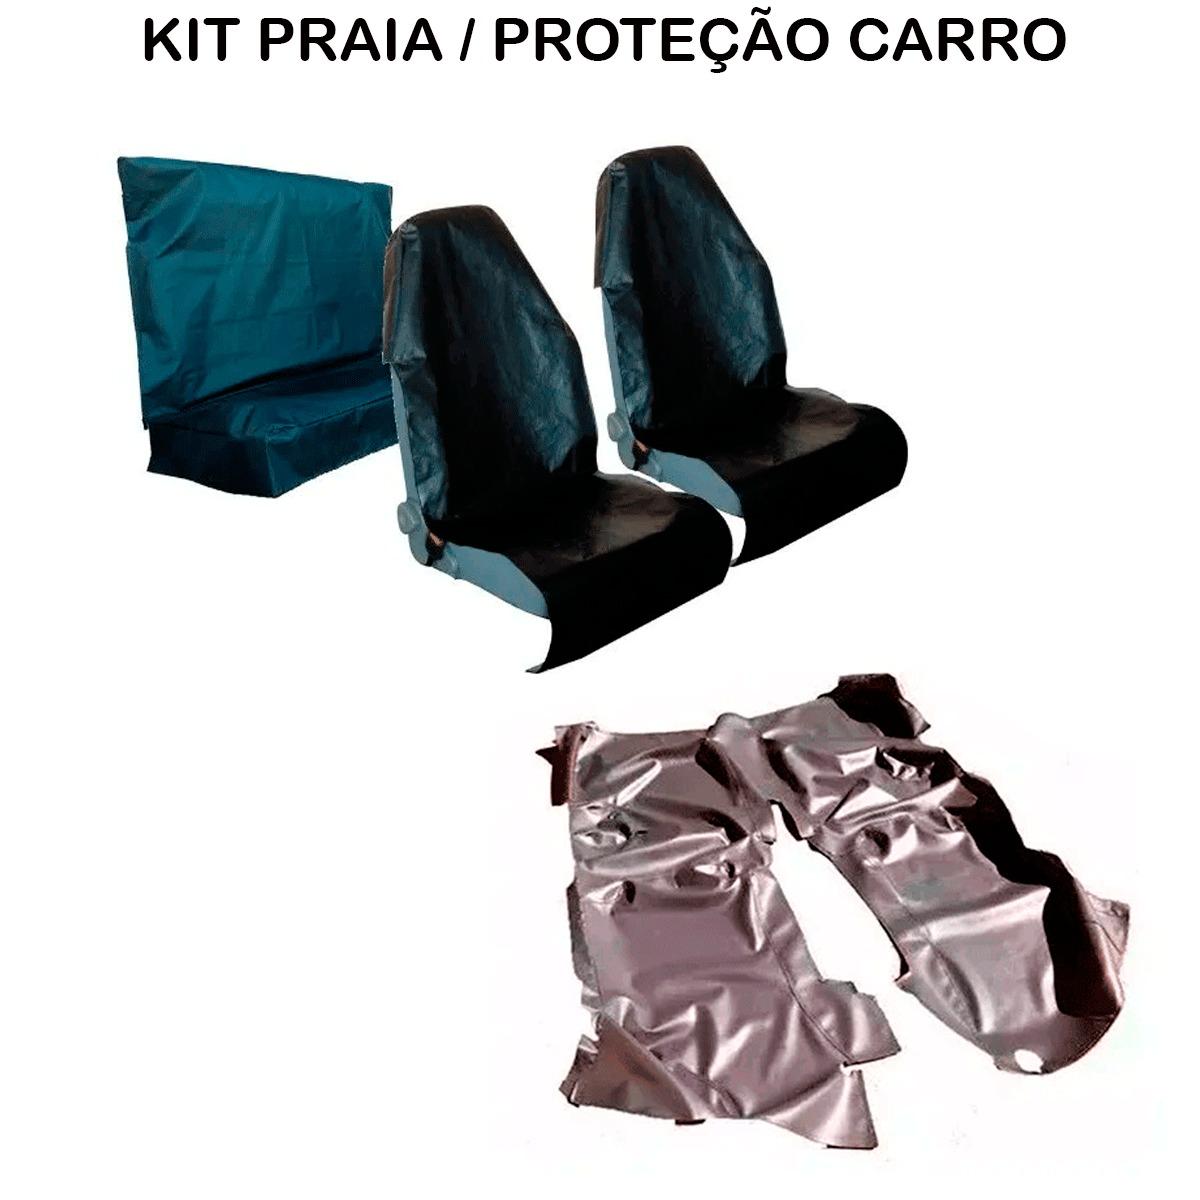 Tapete Em Vinil Novo Ford Ká 2014 a 2020 + Capa Banco Protecao Banco Areia Suor Academia